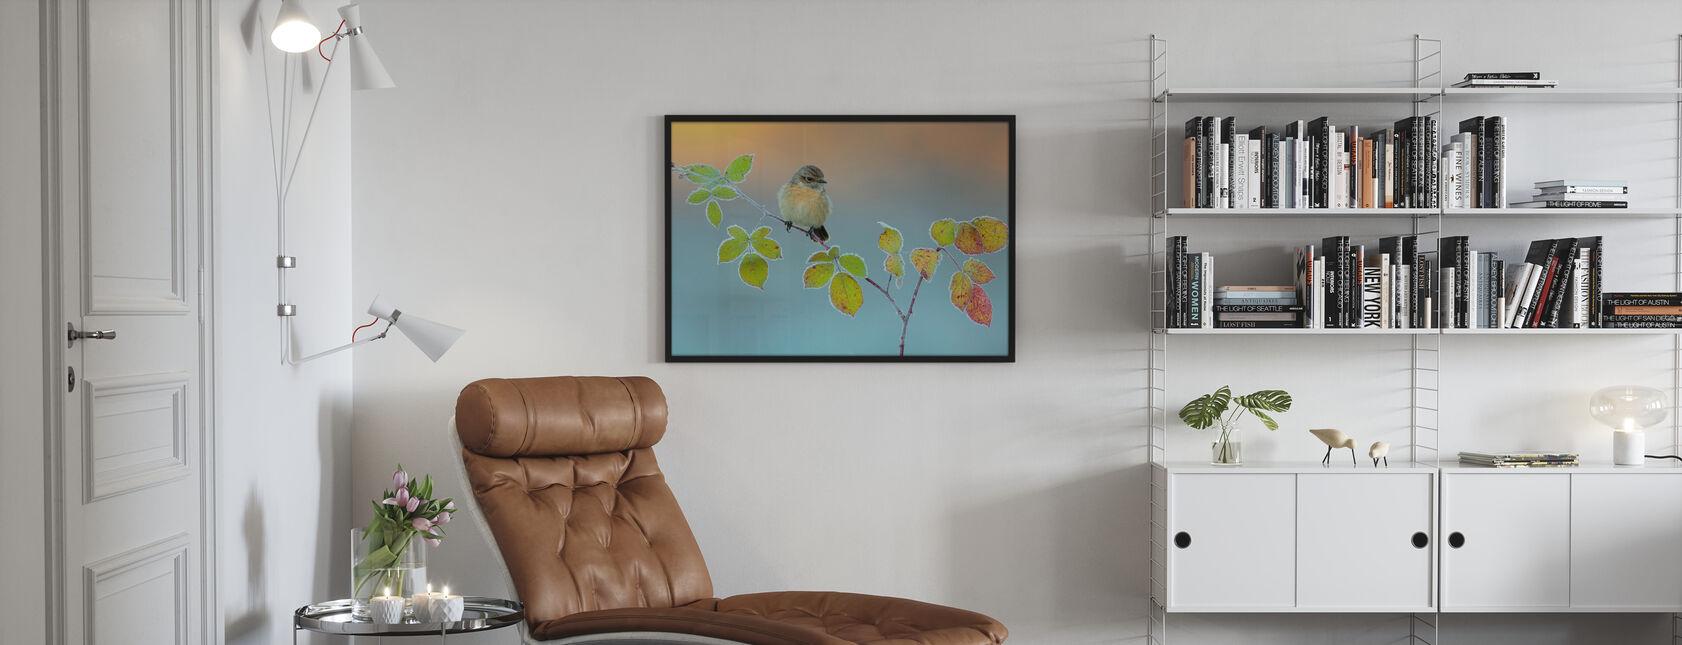 Vinter färger - Inramad tavla - Vardagsrum